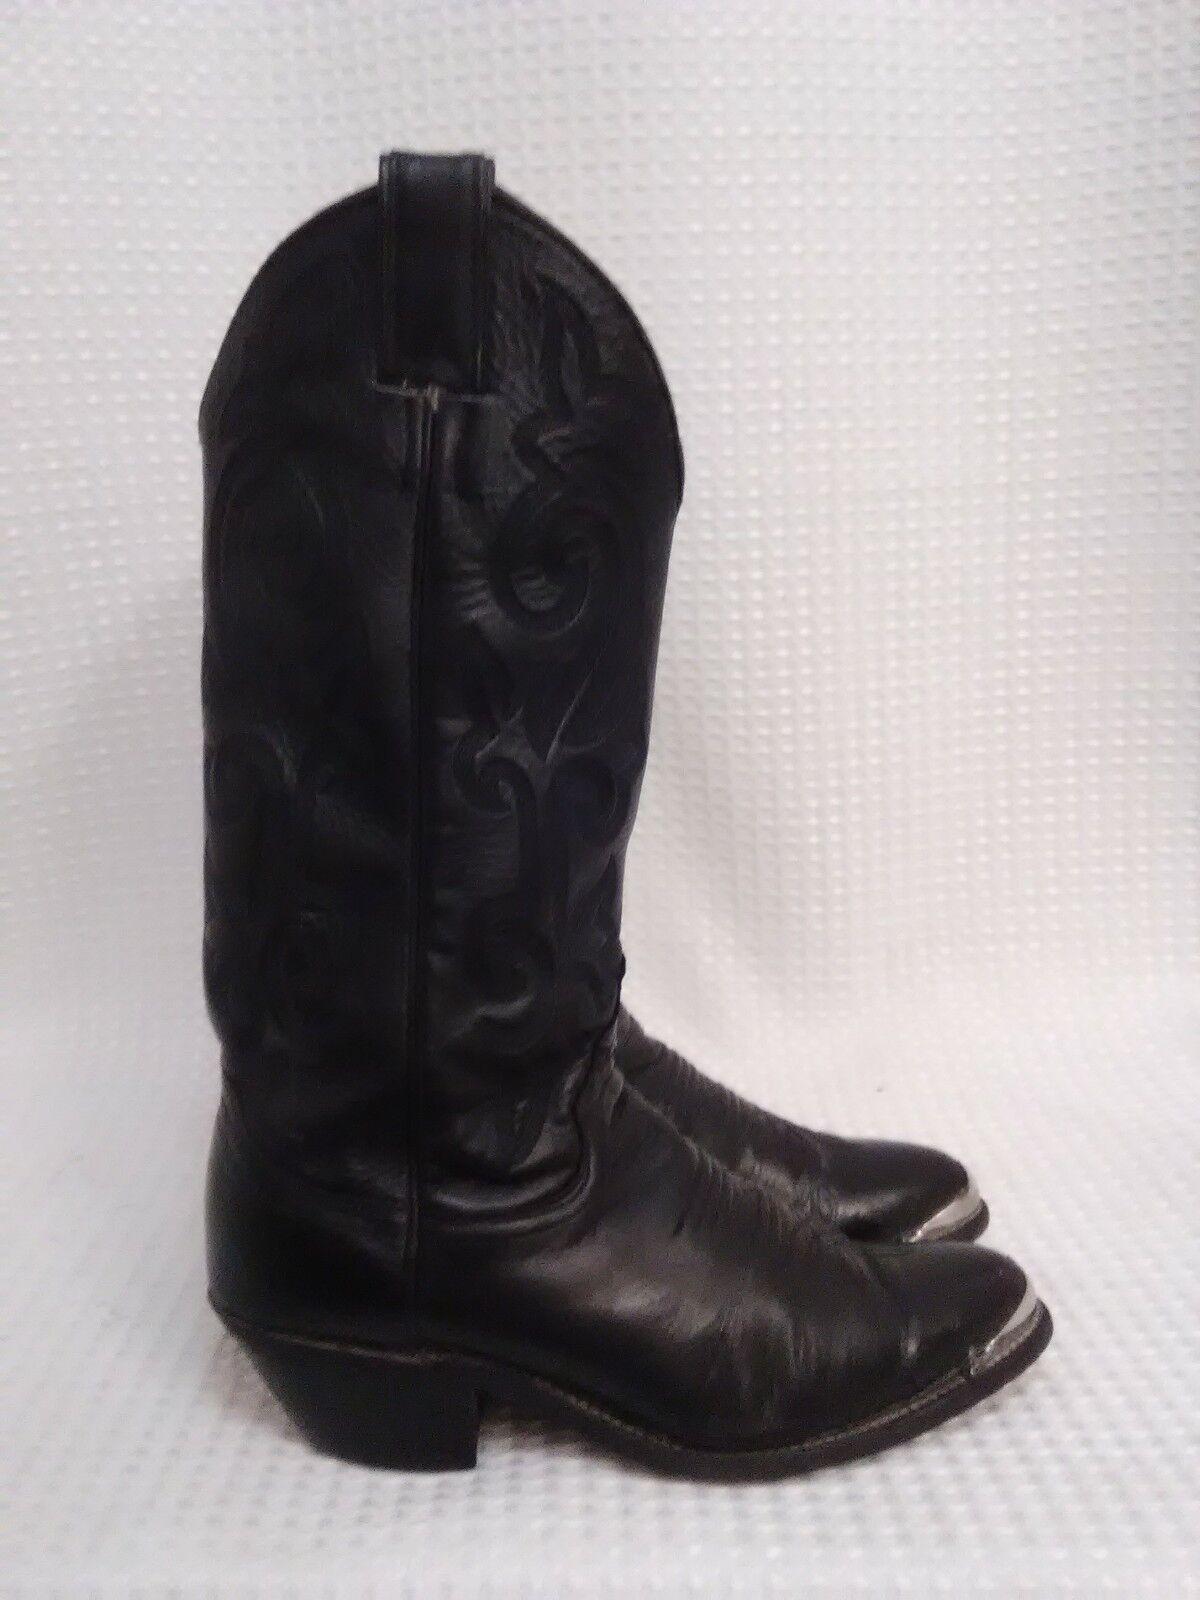 Justin Boots Black London L4911 Cowboy Boots Women Size 6B w silver toe gaurds